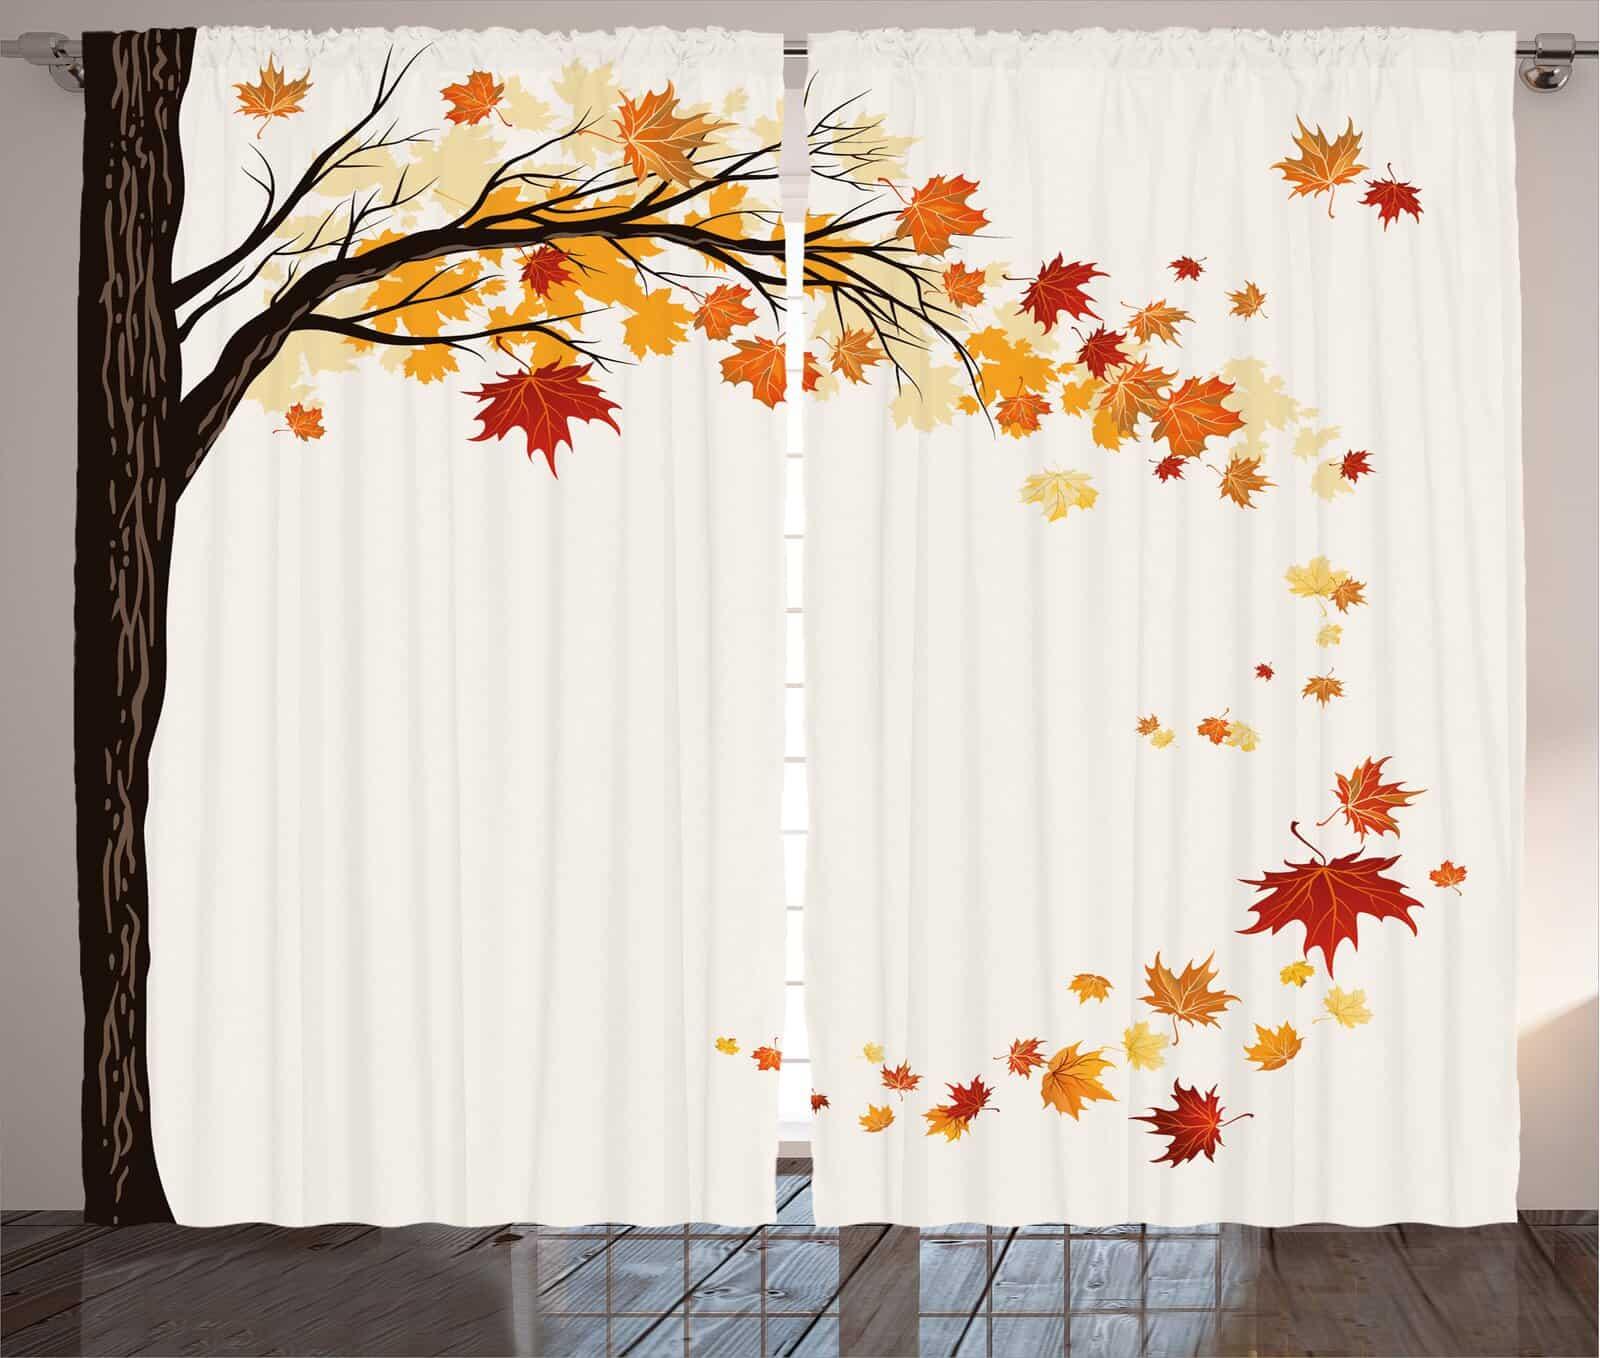 Add an Autumn Themed Mural Curtain Set